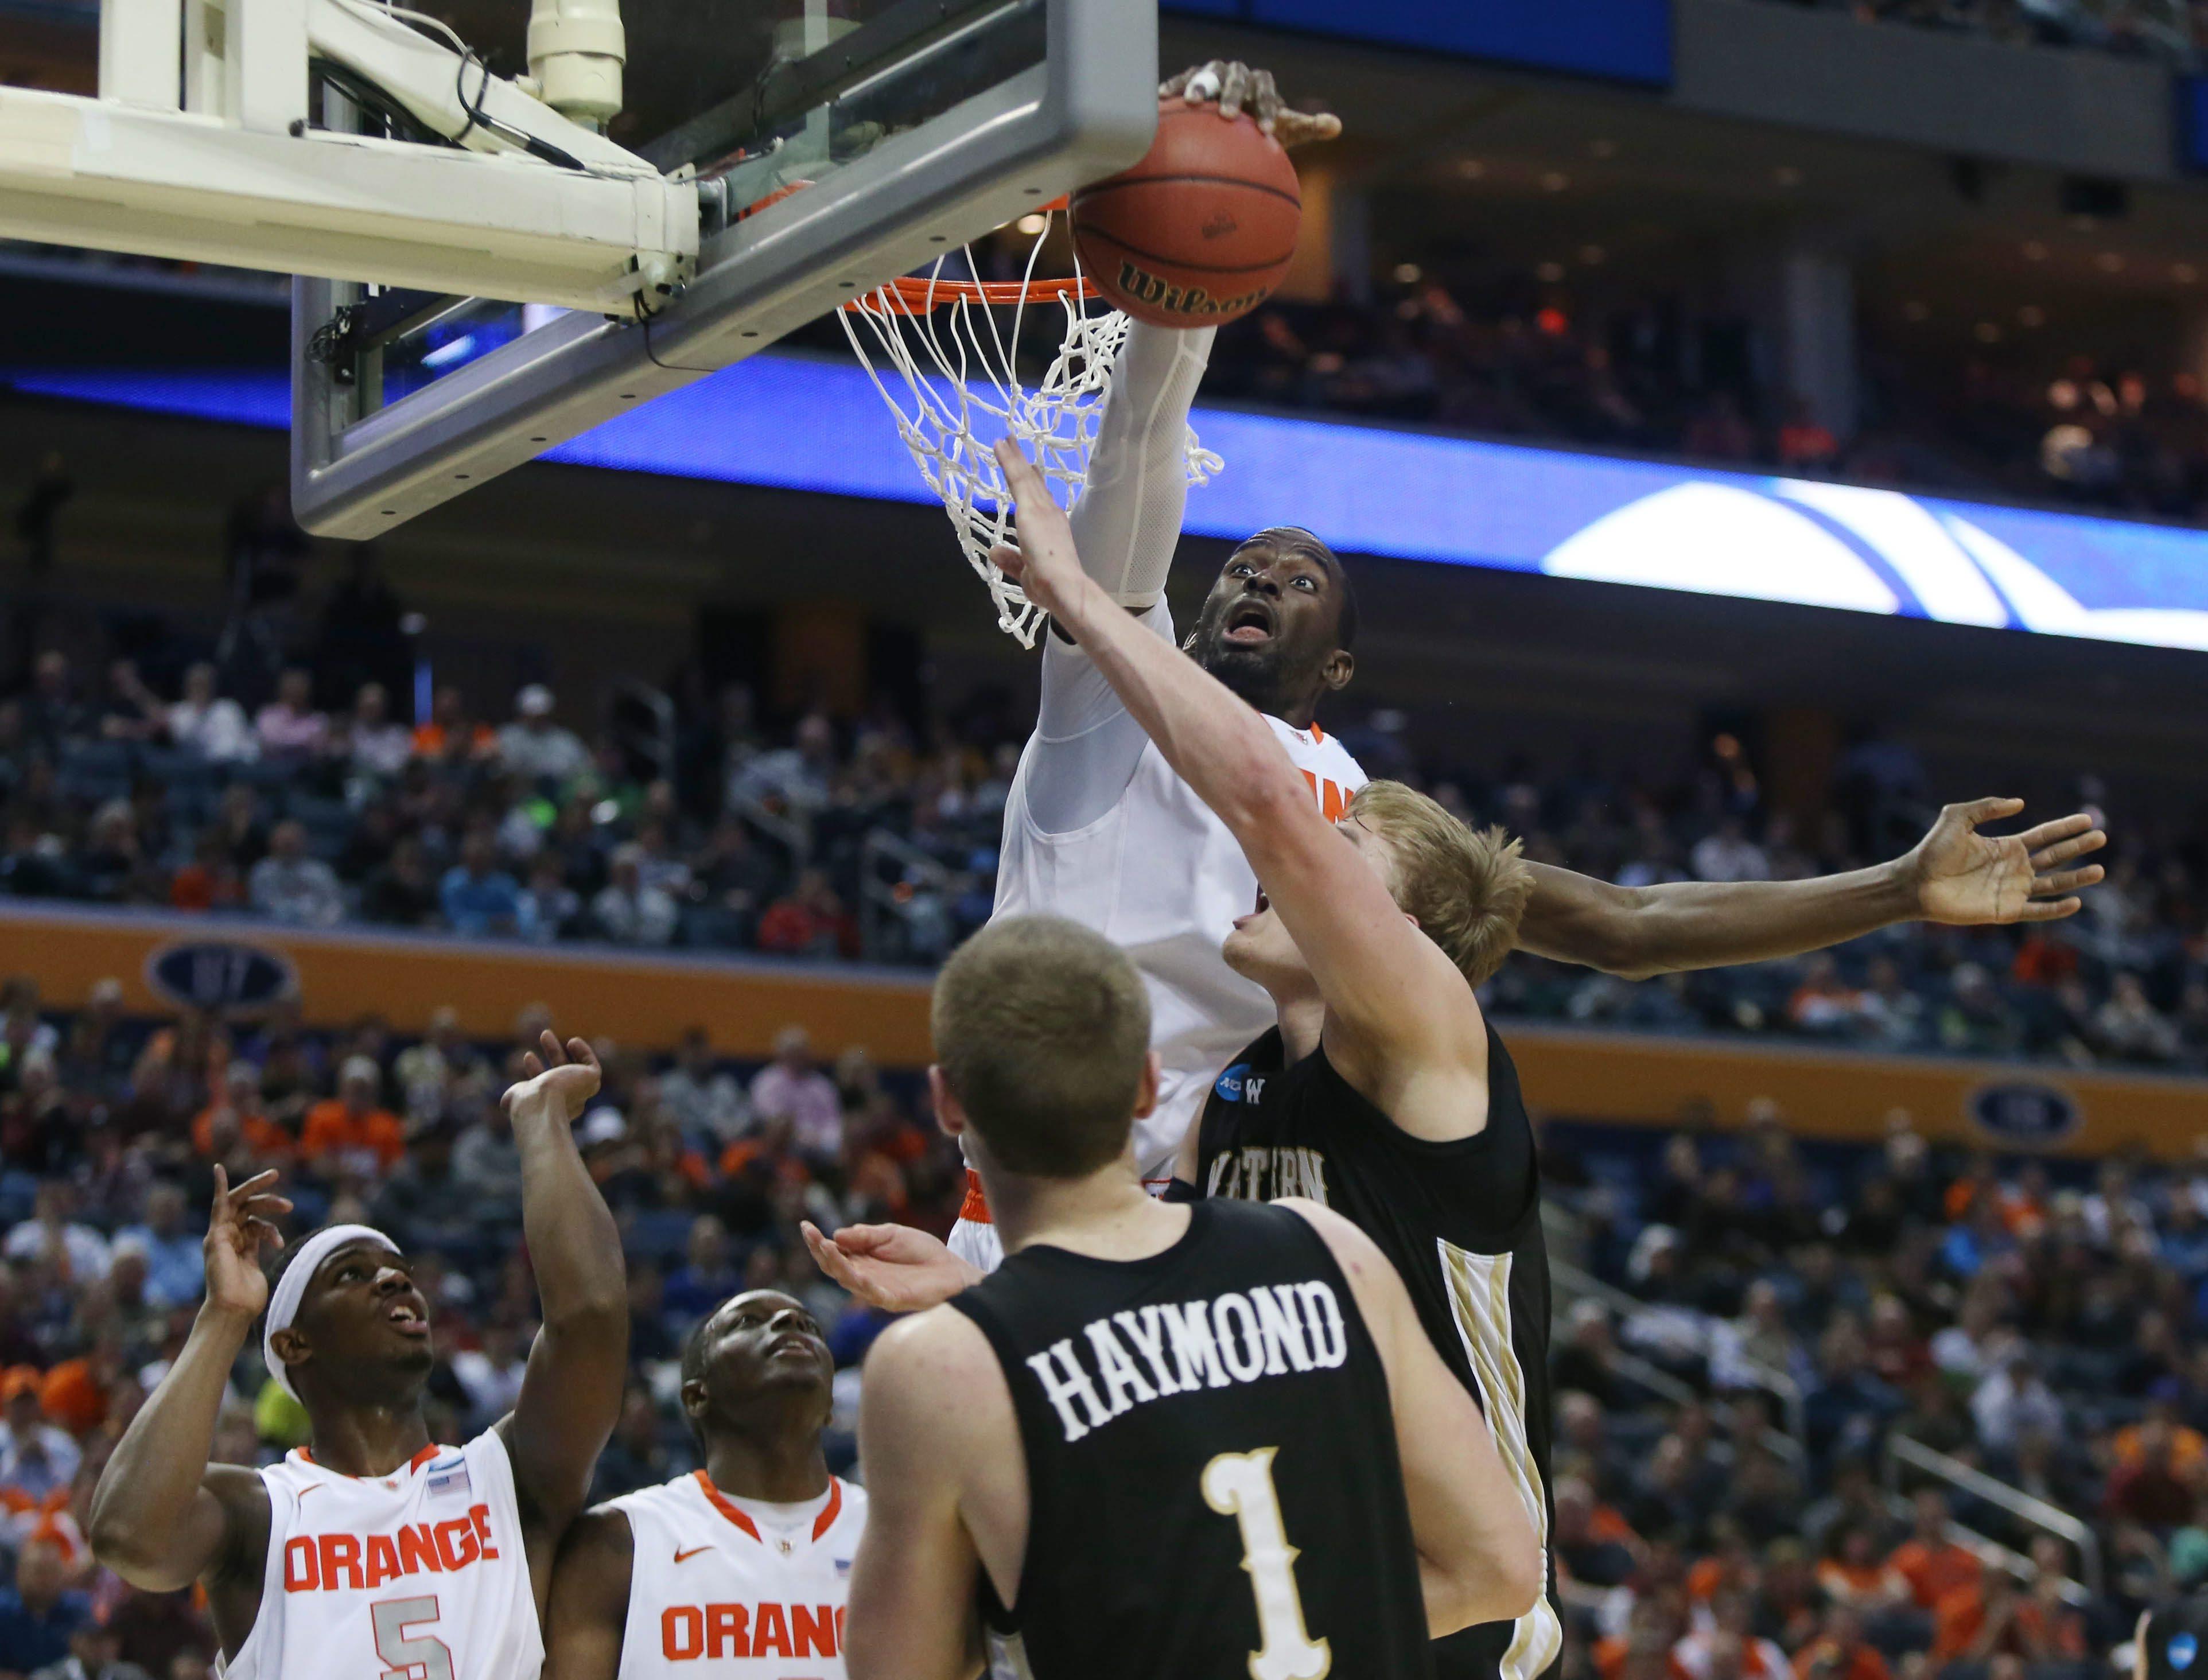 Syracuse's Baye-Moussa Keita blocks a shot attempt by Western Michigan's Connor Tava.  (Robert Kirkham/Buffalo News)